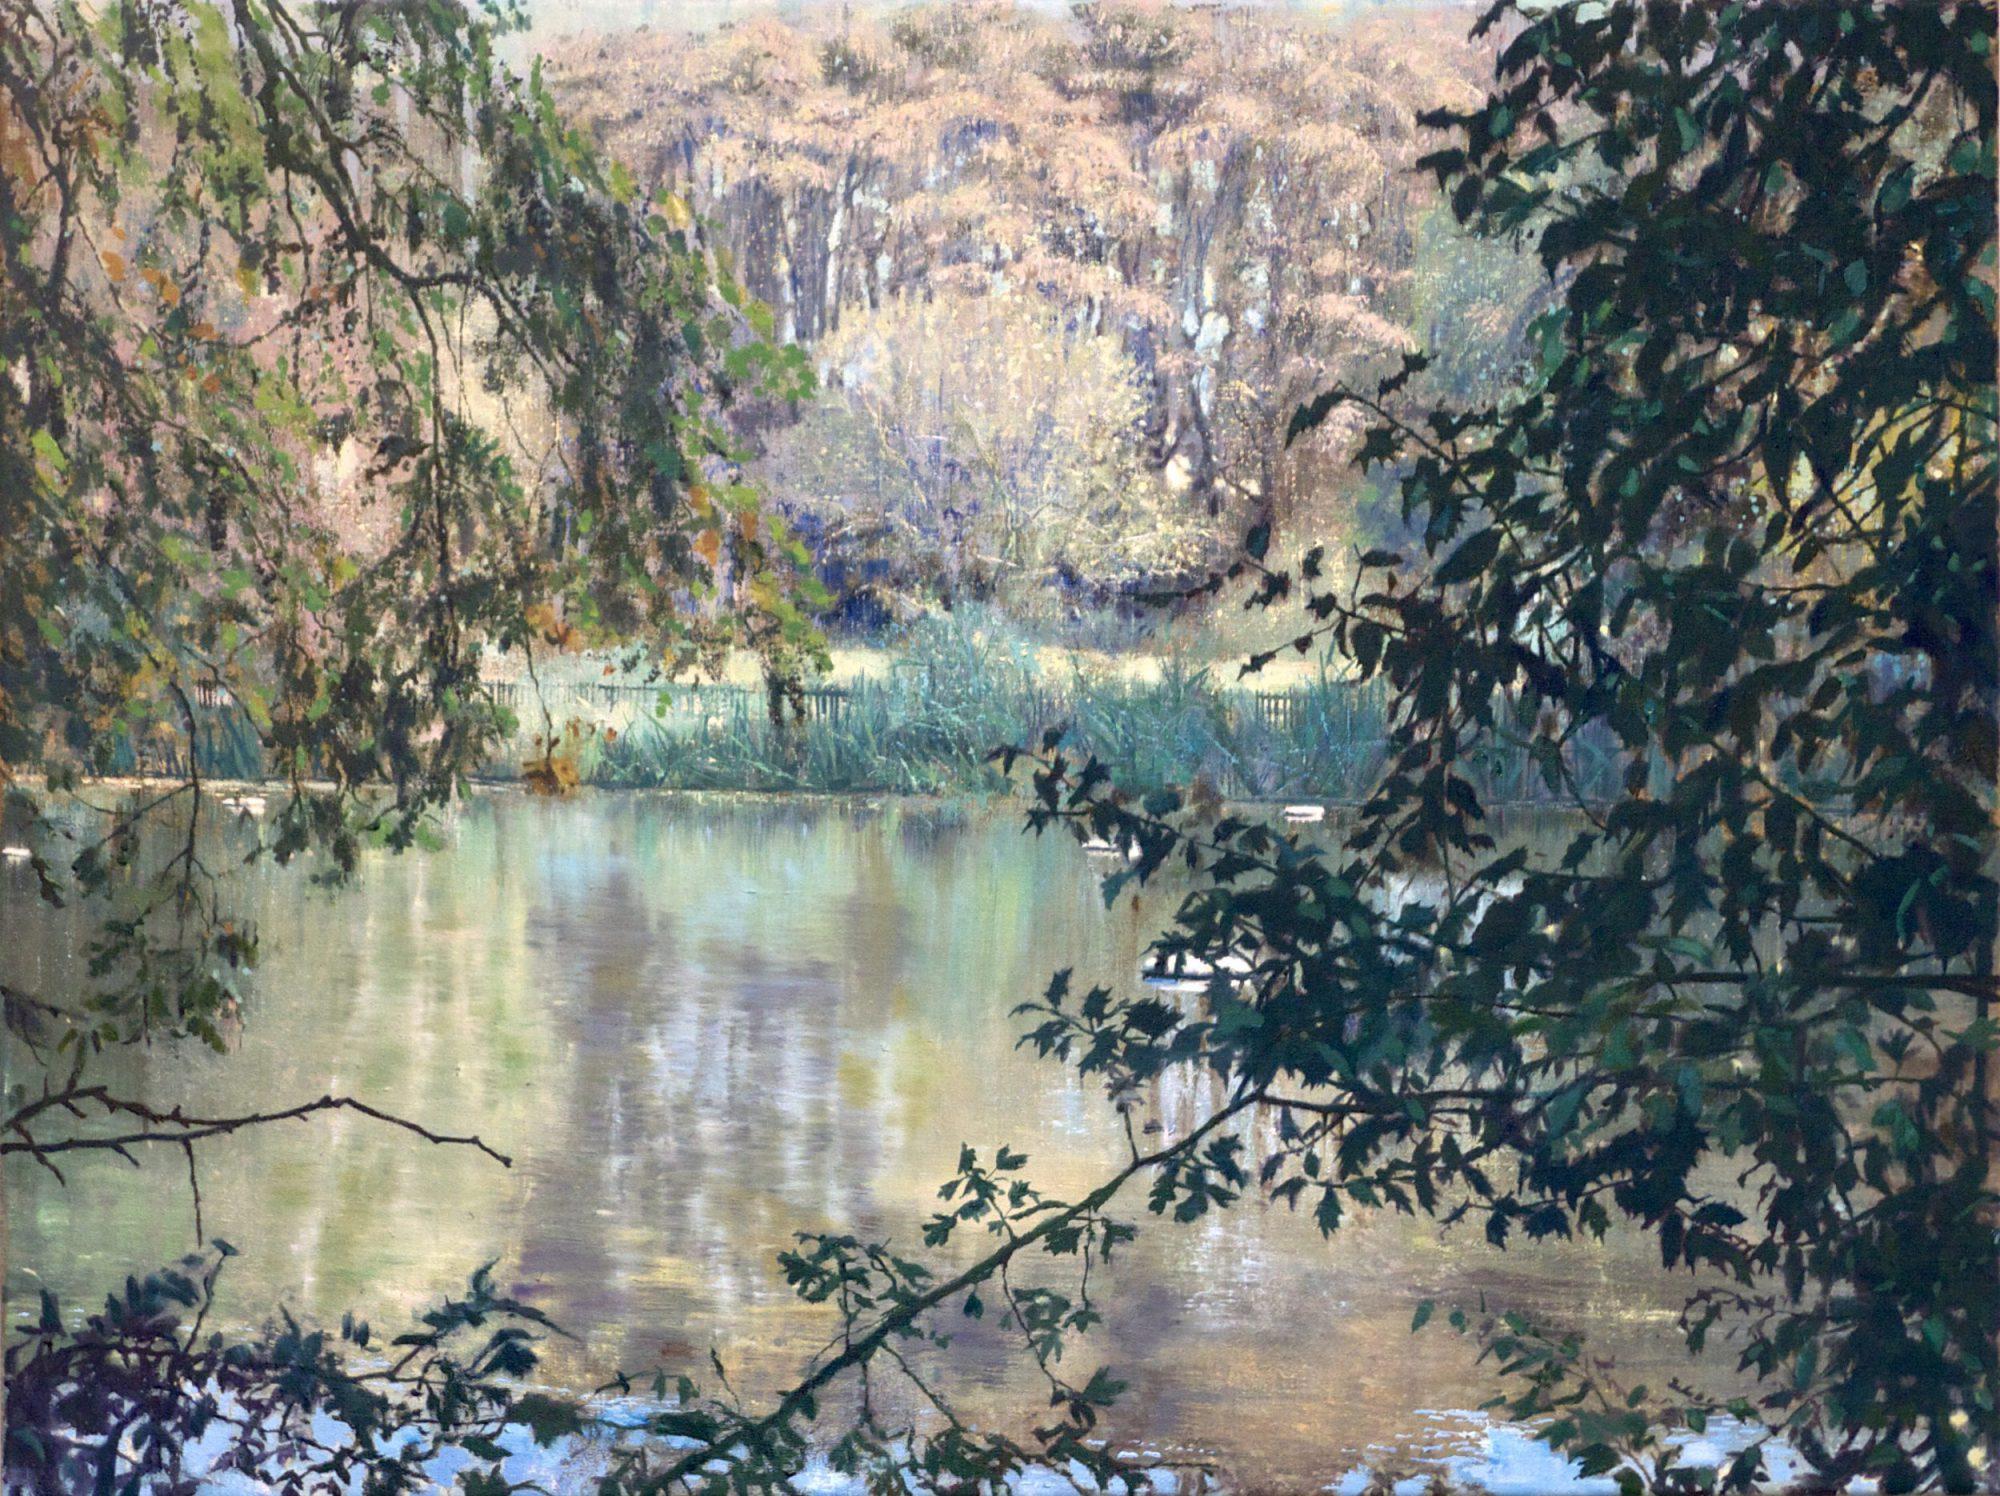 schilderij Isabella Werkhoven London Pond 1 zwemvijver in bos hek water herfst